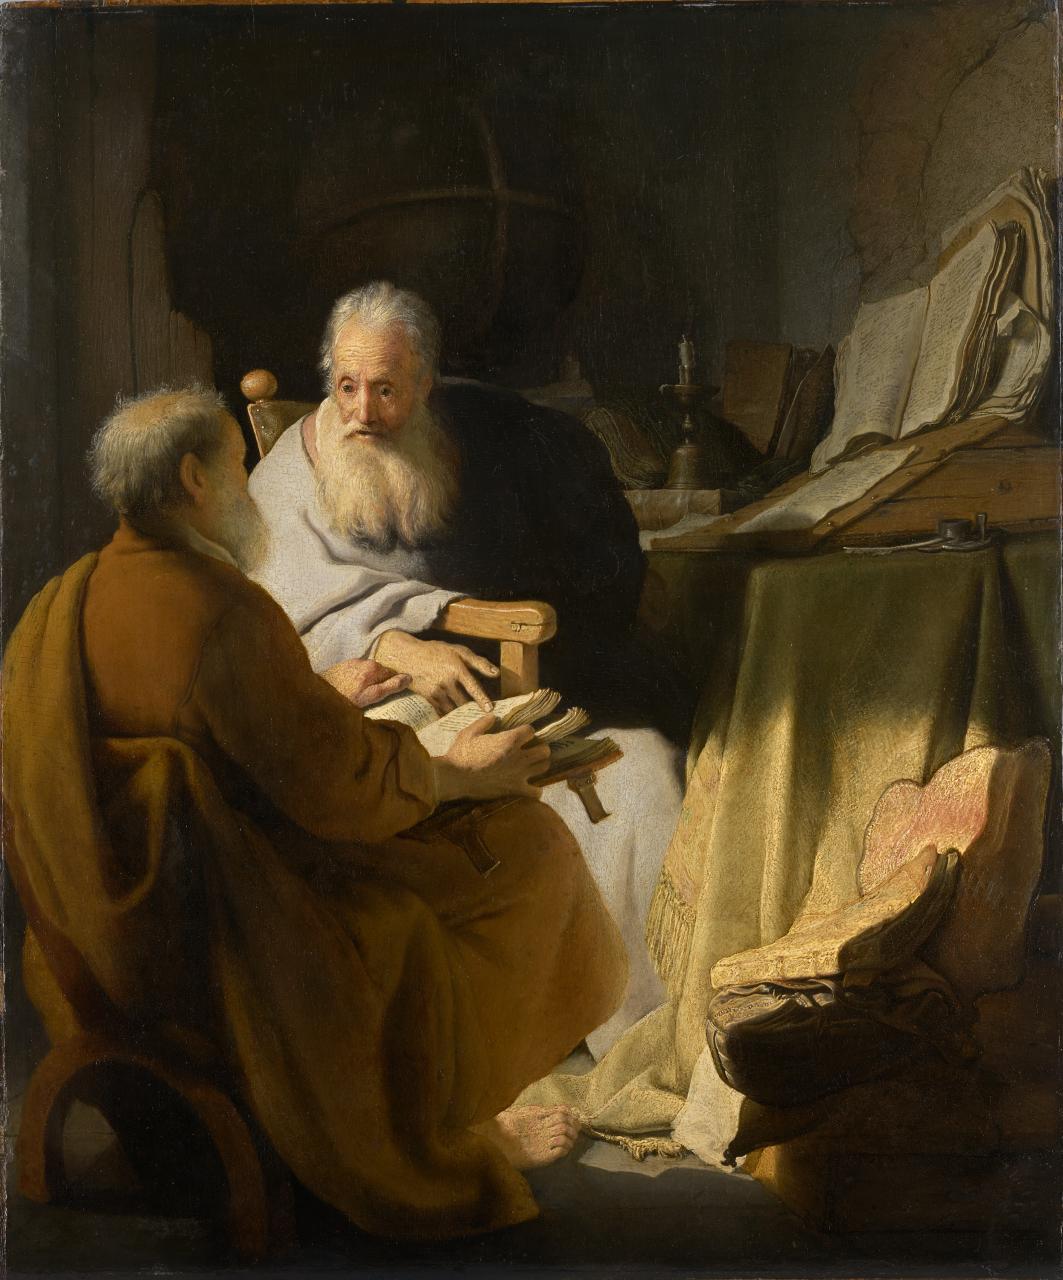 Rembrandt - Petrus und Paulus im Gespräch (1628 Melbourne)